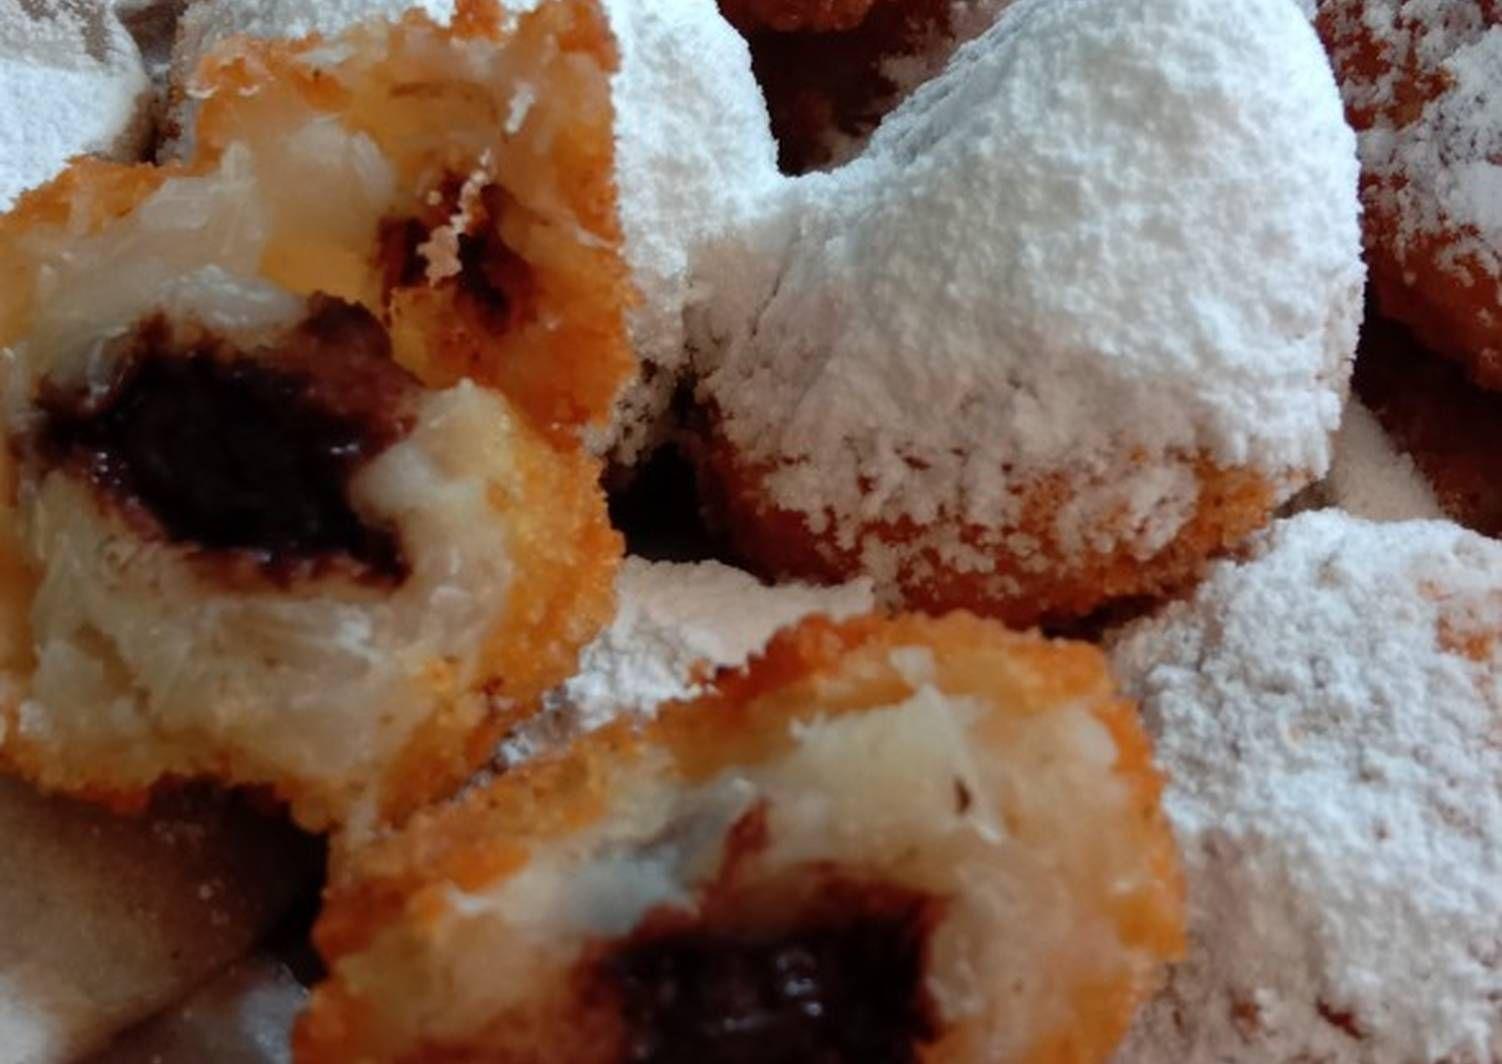 Resep Bola Bola Singkong Coklat Oleh Wiwin Uhrowia Resep Resep Coklat Masakan